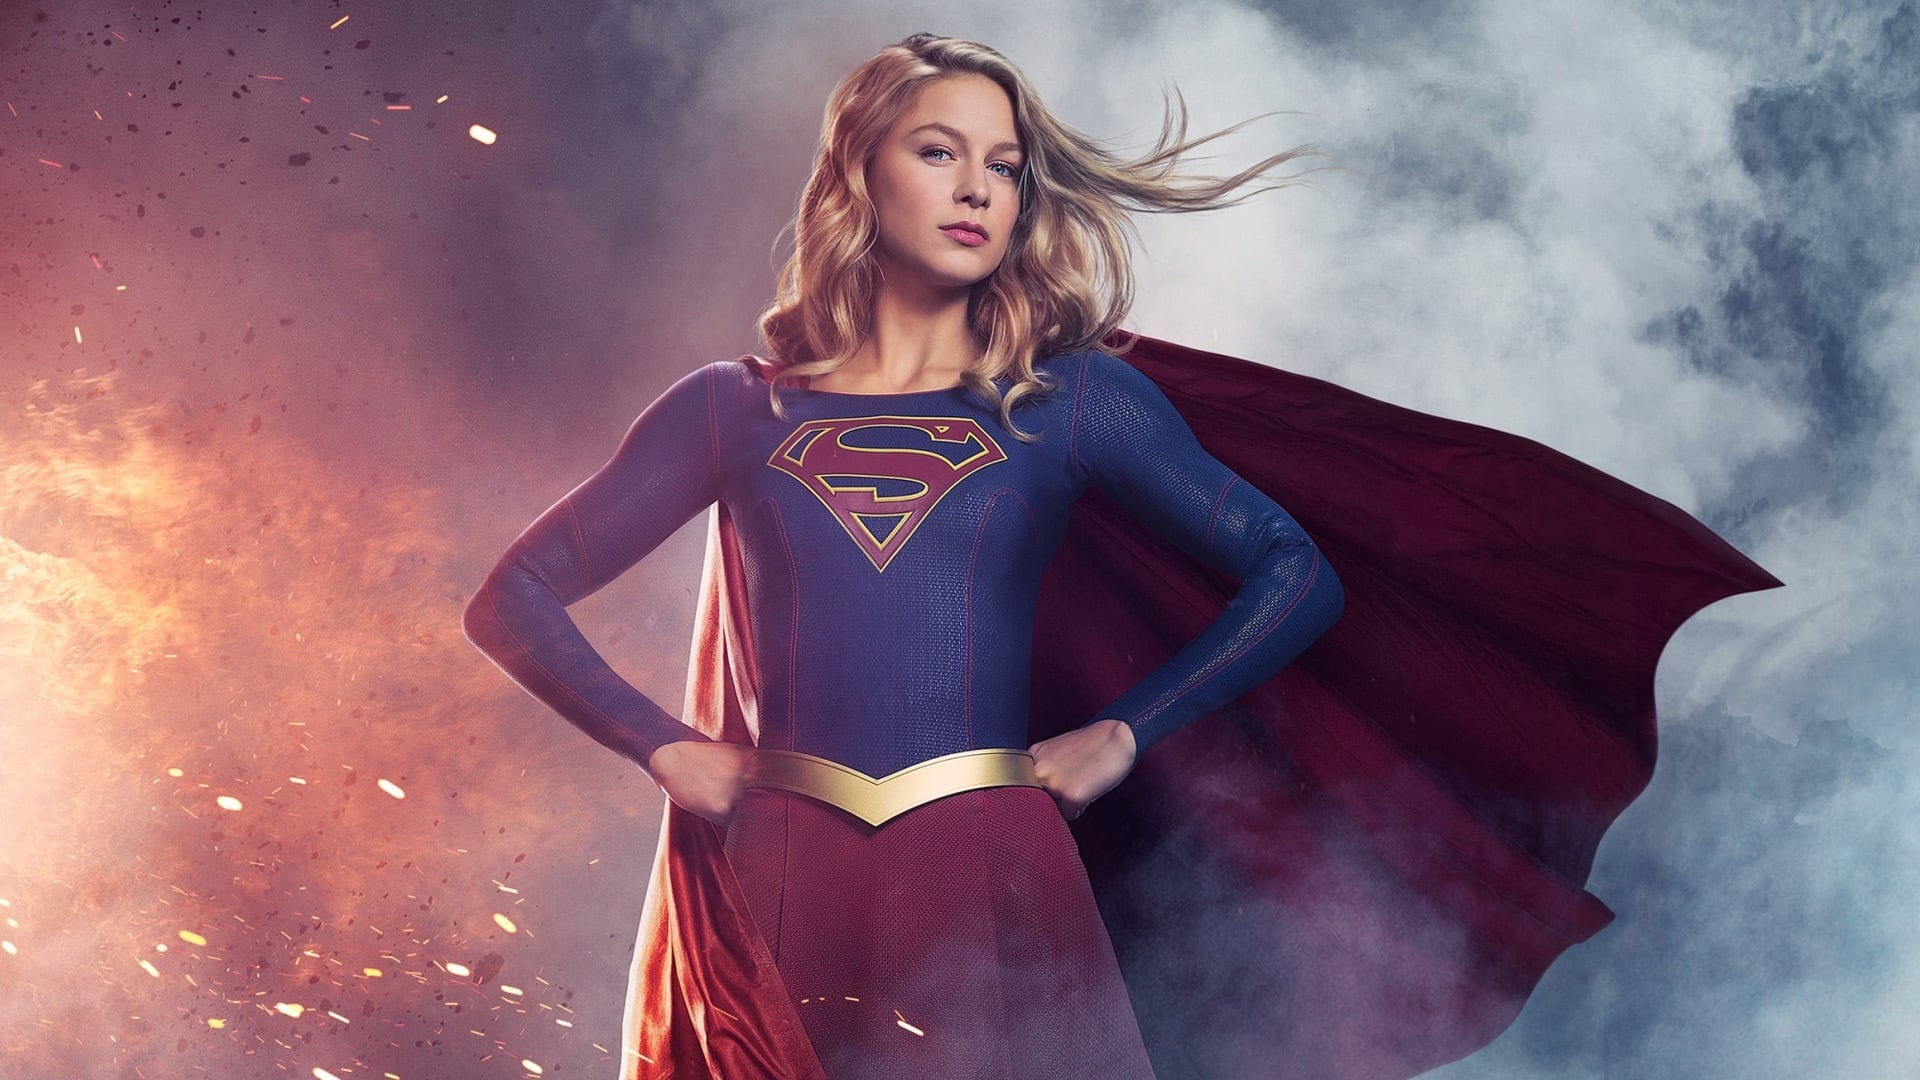 Supergirl free wallpaper